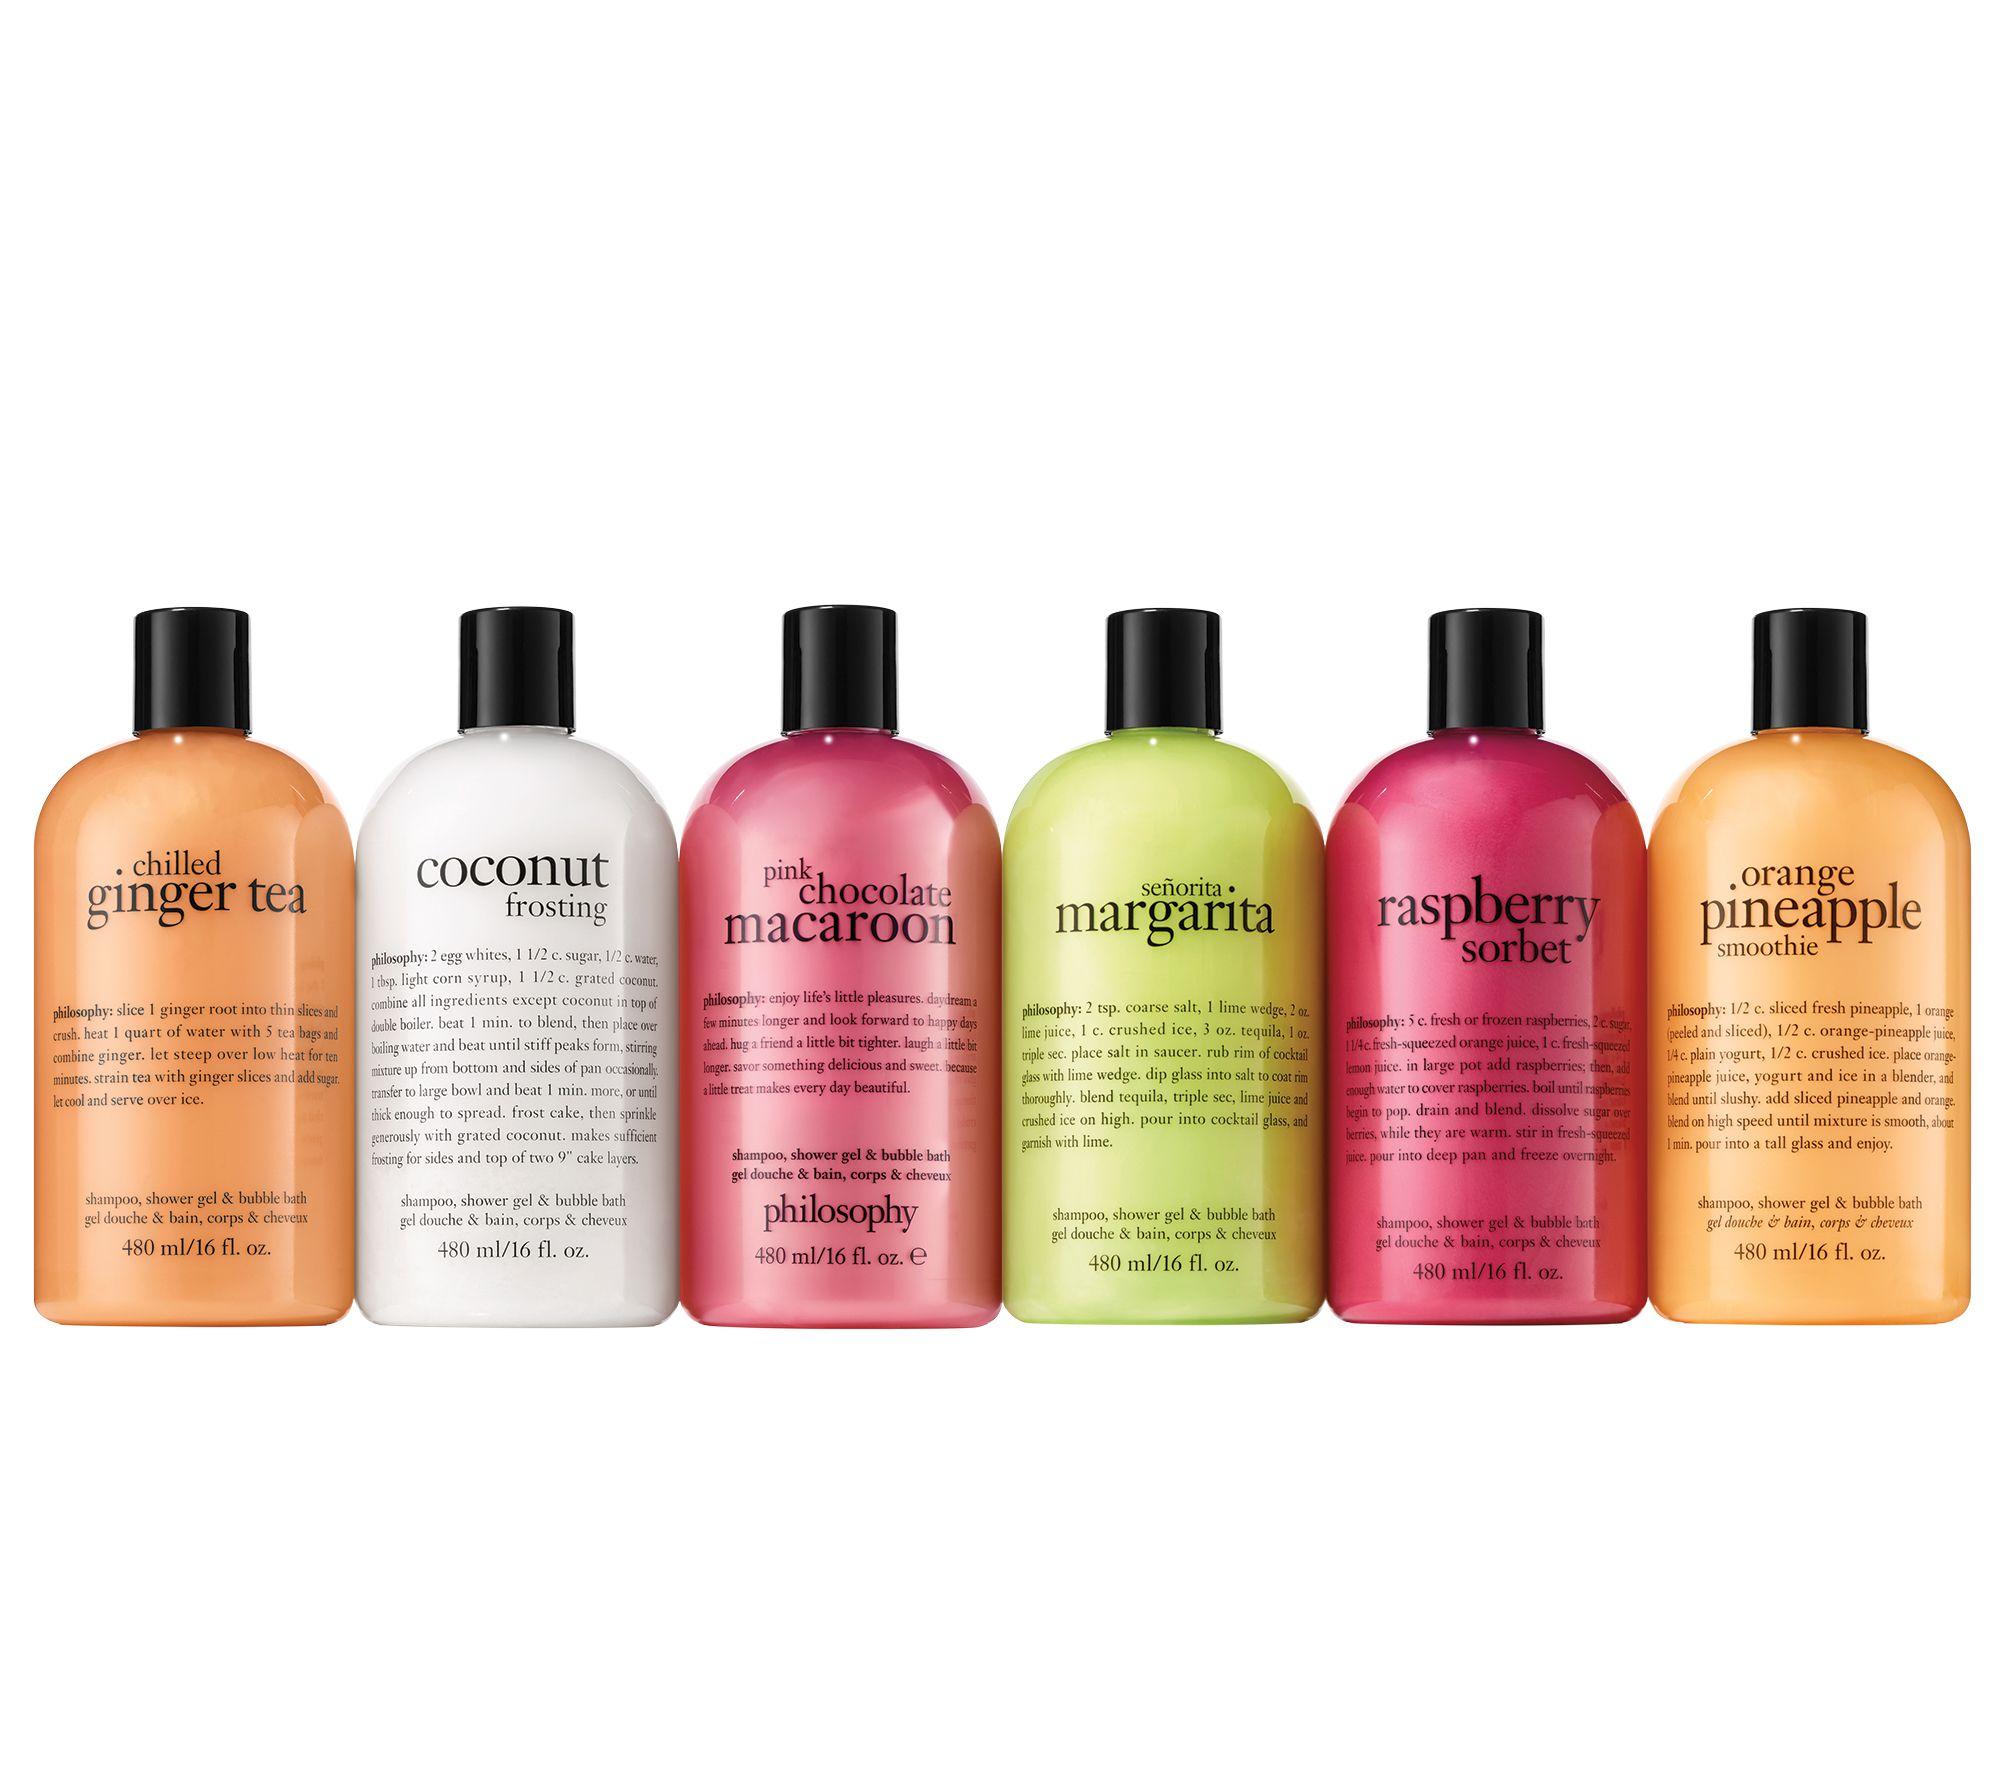 philosophy taste of summer 6 piece shower gel kit Auto Delivery